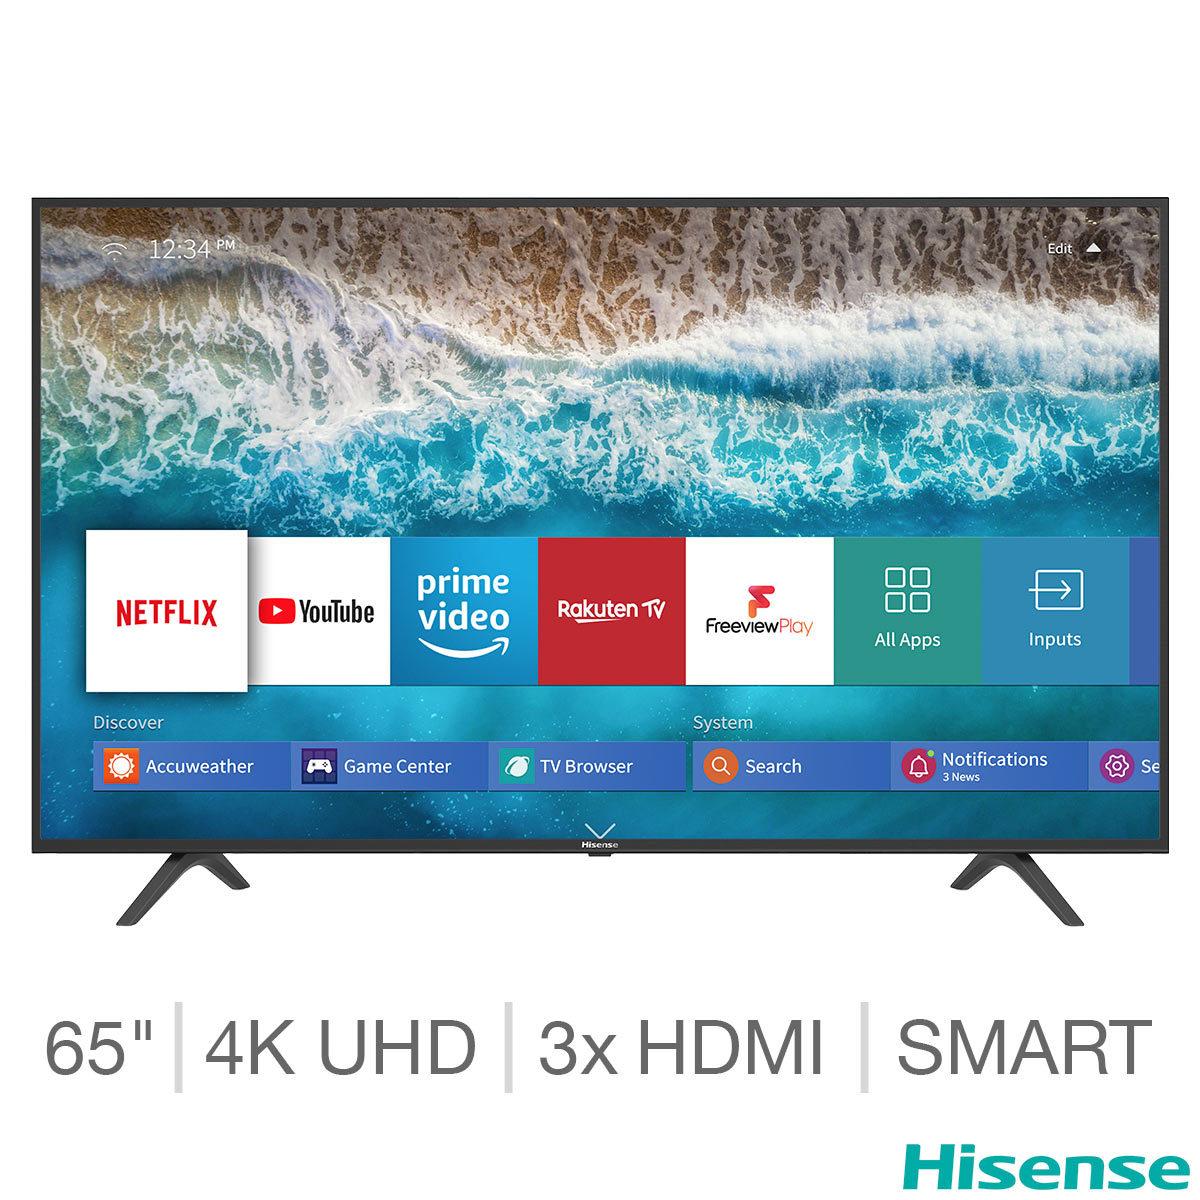 Hisense H65B7100UK 65 Inch 4K Ultra HD Smart TV at Costco for £419.98